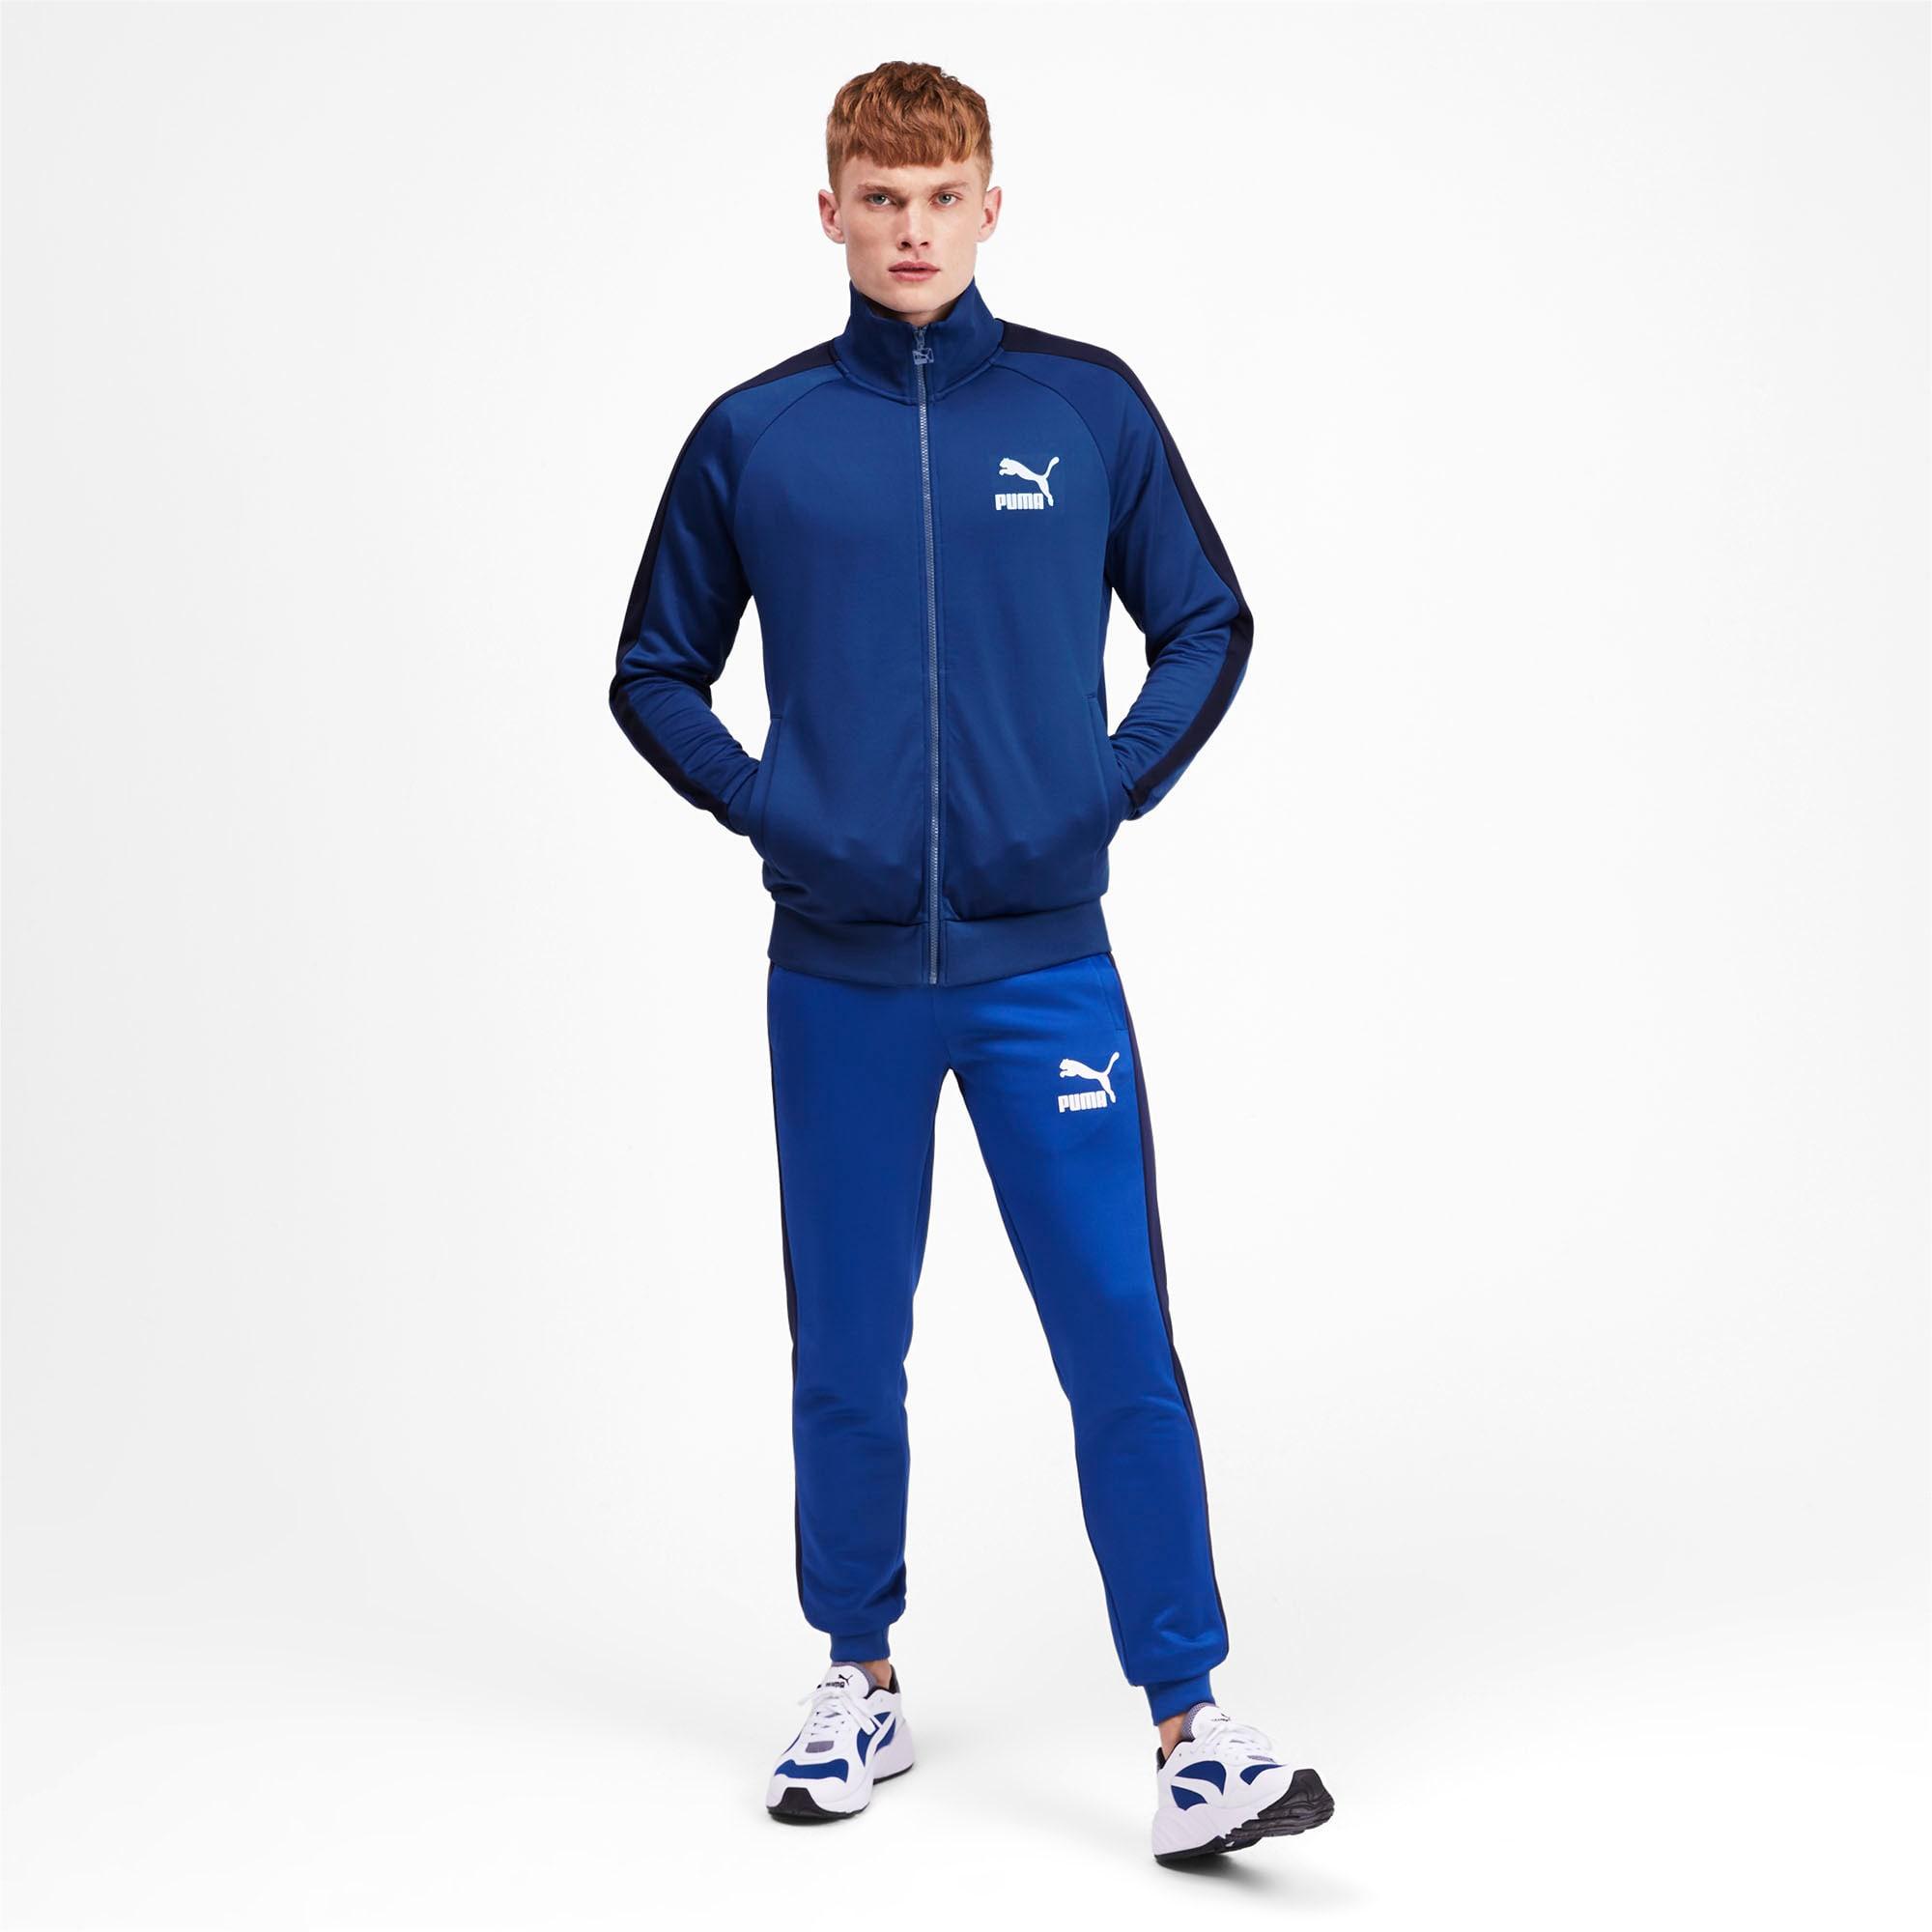 Thumbnail 4 of Iconic T7 Men's Track Jacket, Galaxy Blue, medium